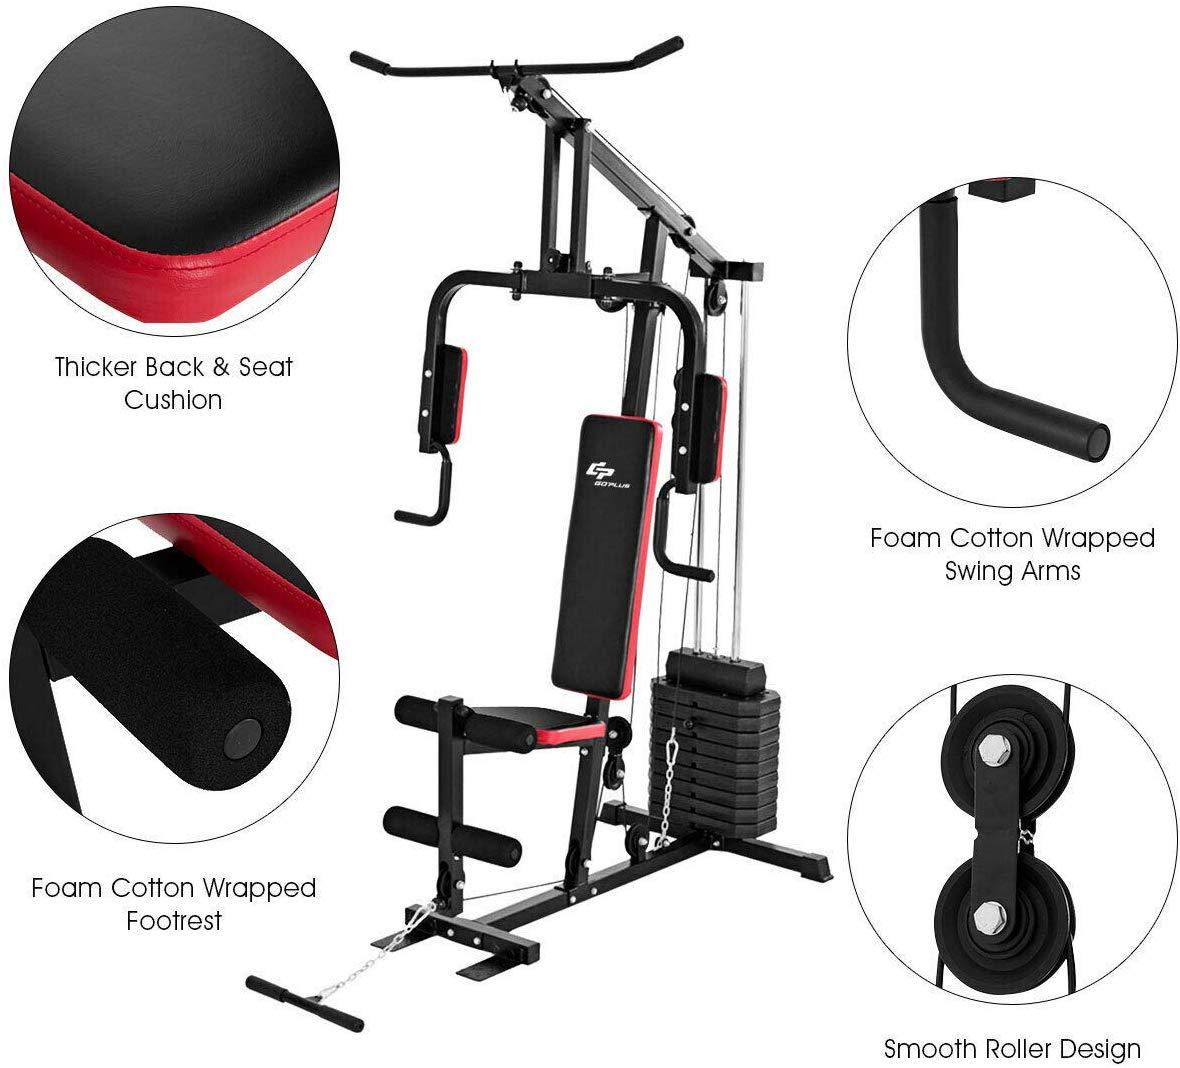 GOPLUS Multifunction Home Gym System